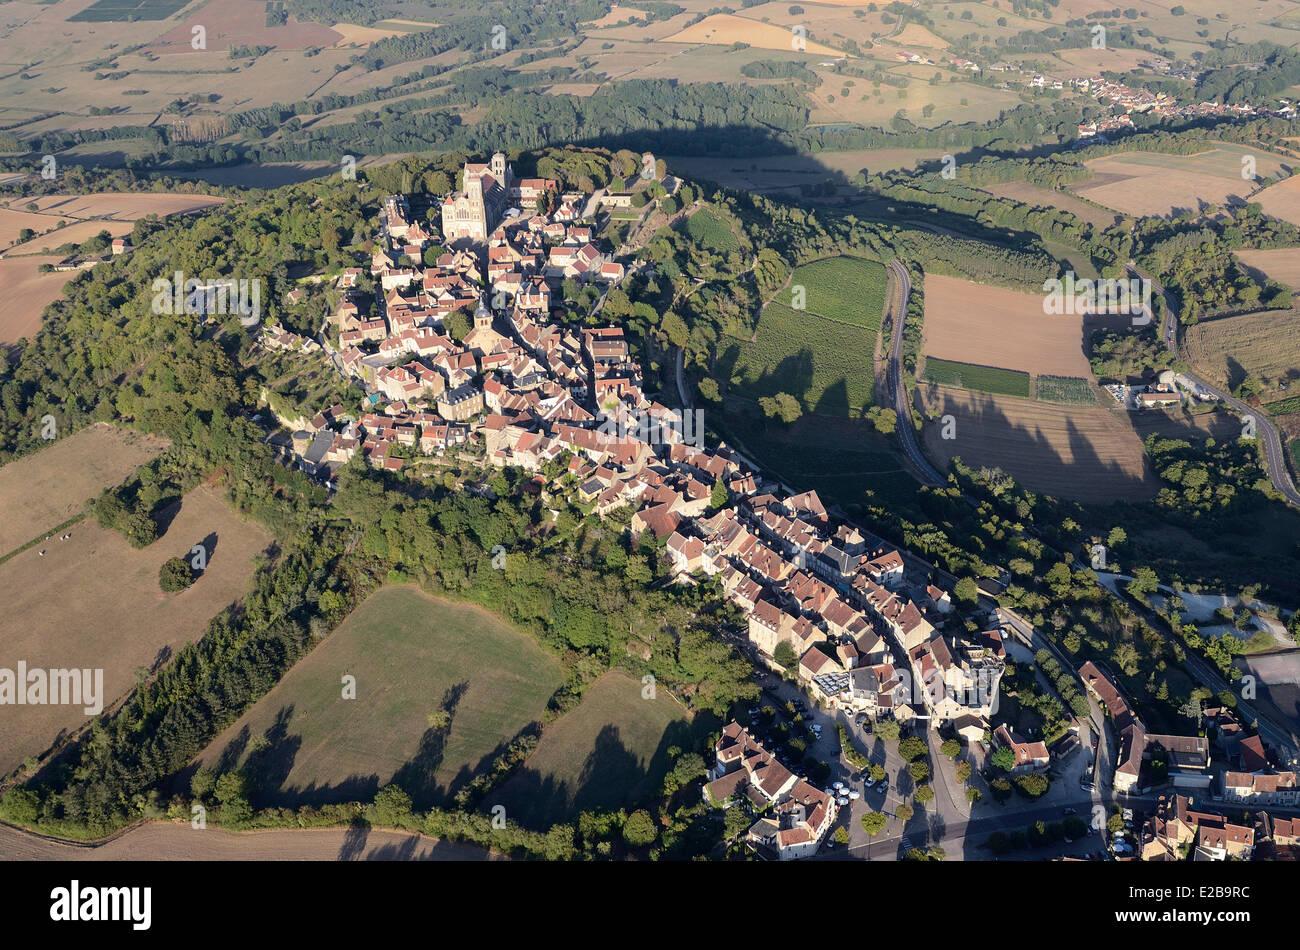 France yonne parc naturel regional du morvan regional for Region yonne